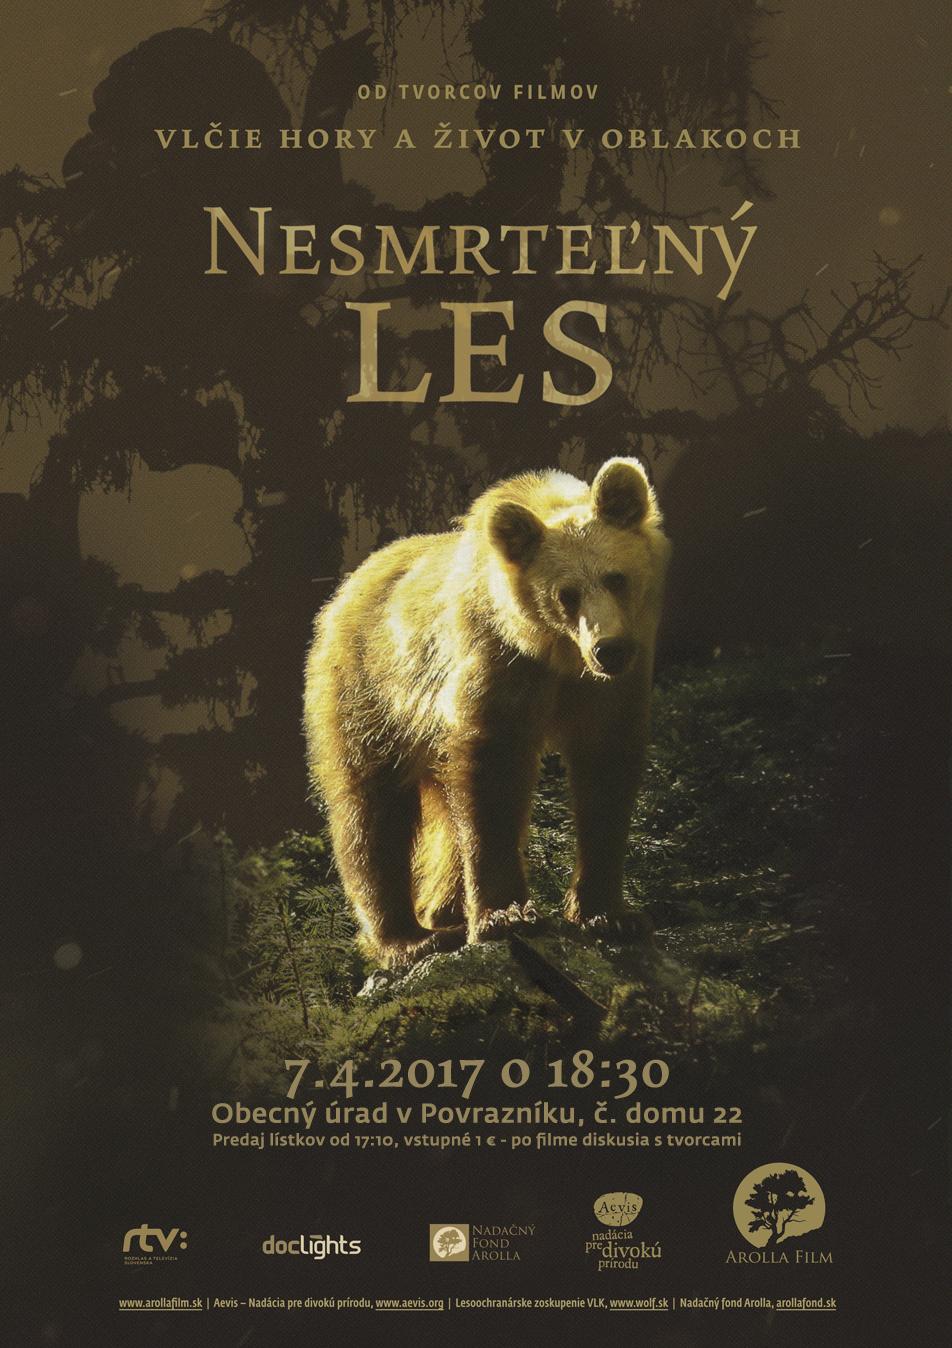 Plagát k filmu Nesmrteľný les